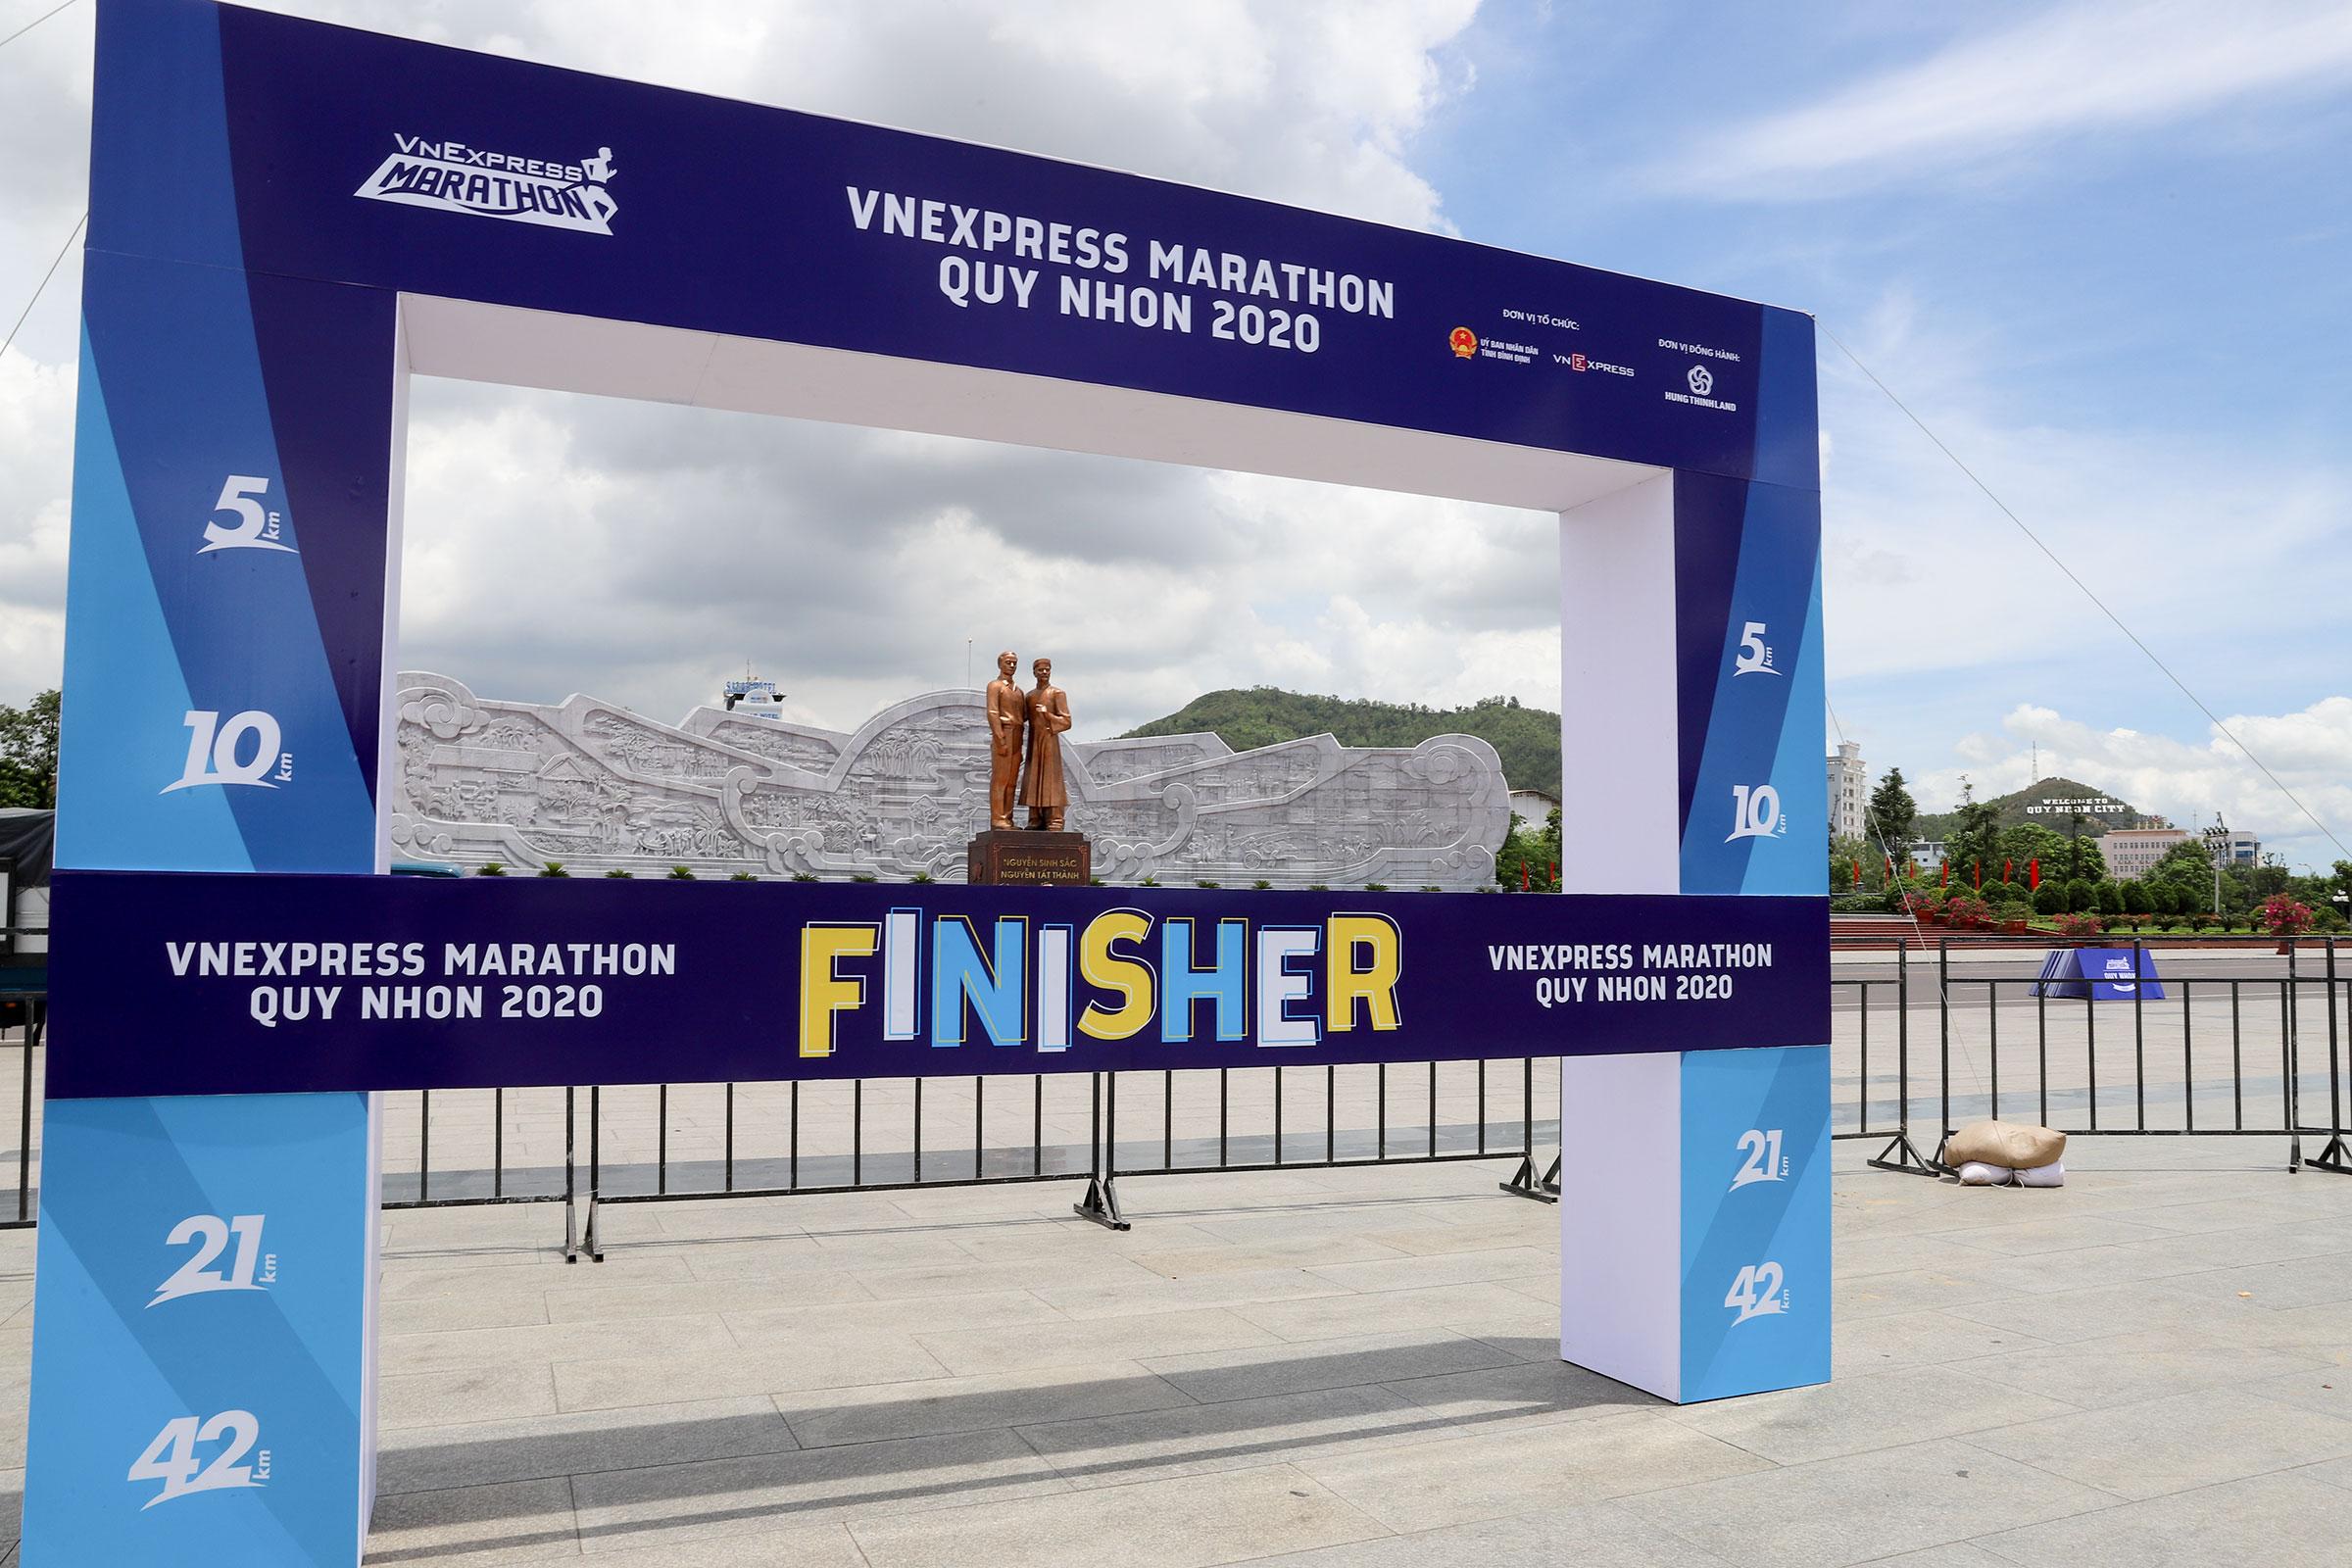 Beach hub gets make-over ahead of VnExpress Marathon